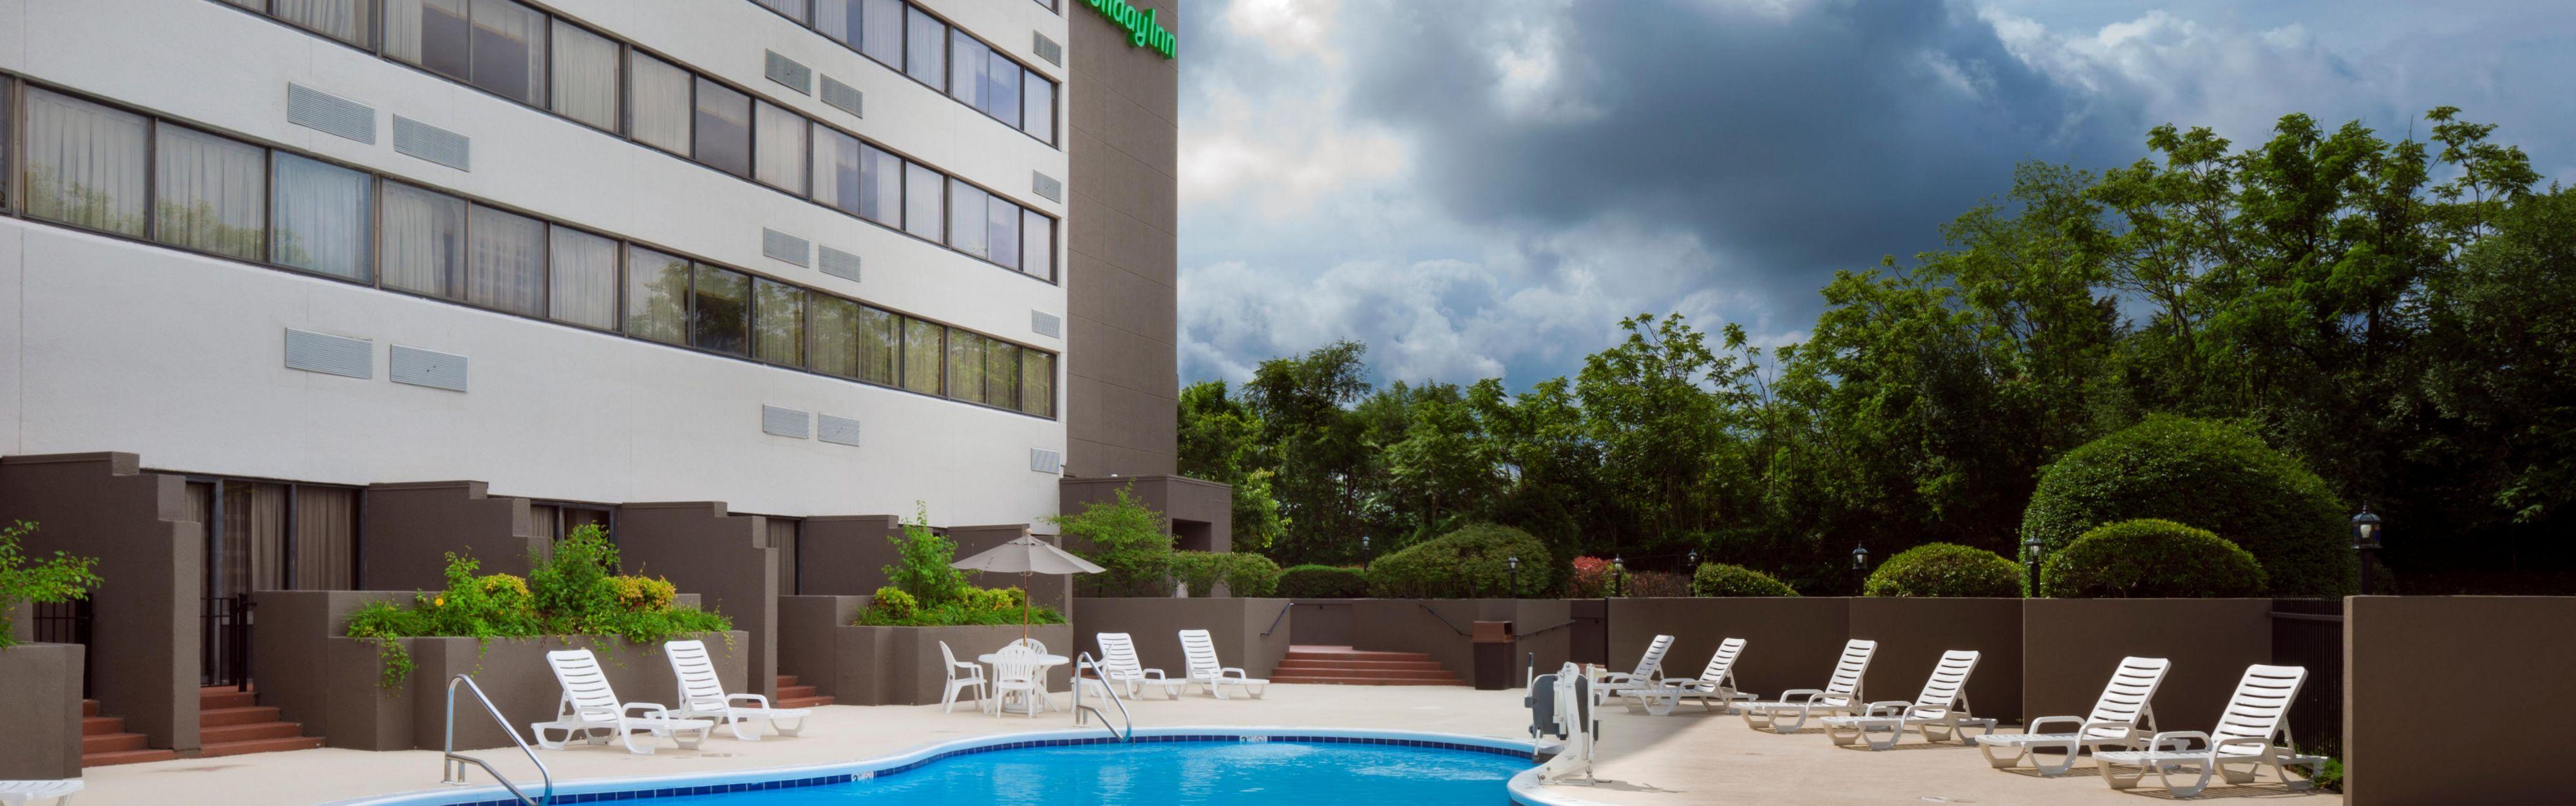 Holiday Inn Johnson City image 2